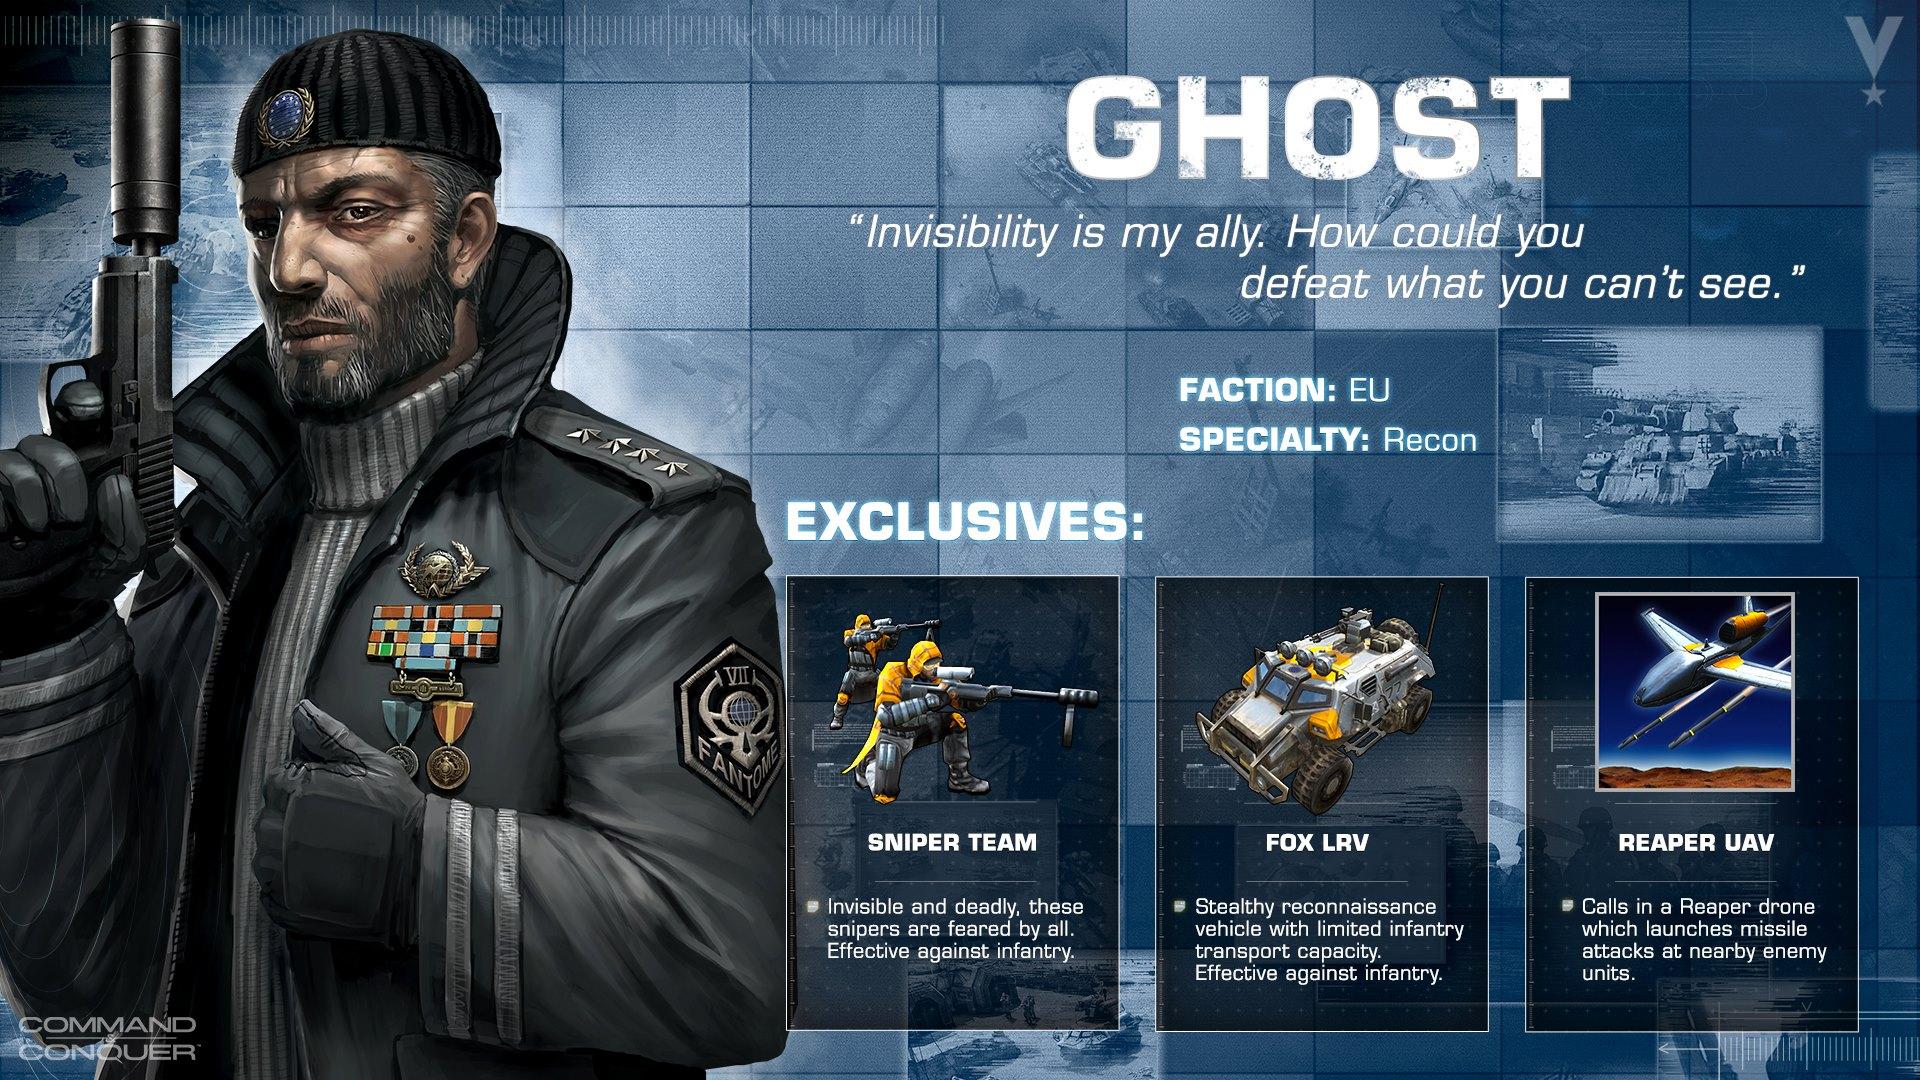 ghost EU General Ghost vorgestellt!